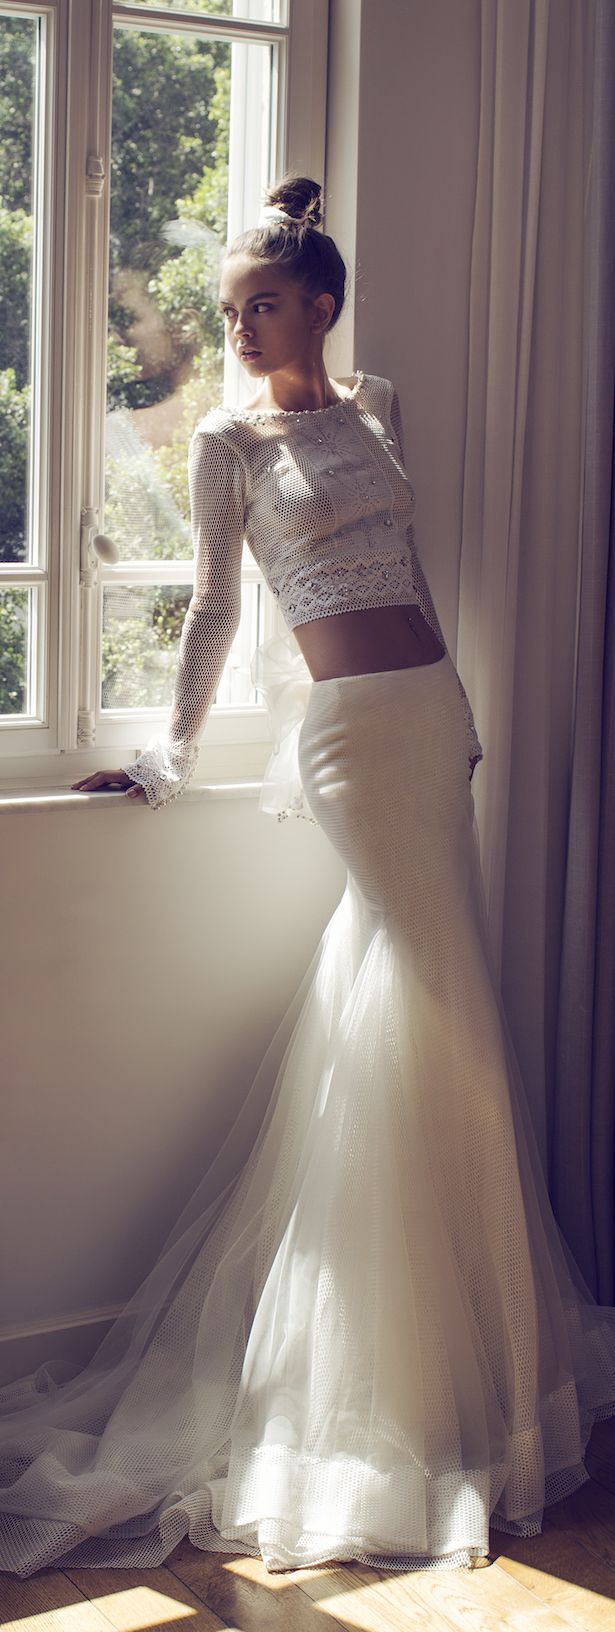 Zahavit Tshuba 2016 Bridal Collection : Mix and Match #vestidodenovia | #trajesdenovio | vestidos de novia para gorditas | vestidos de novia cortos http://amzn.to/29aGZWo